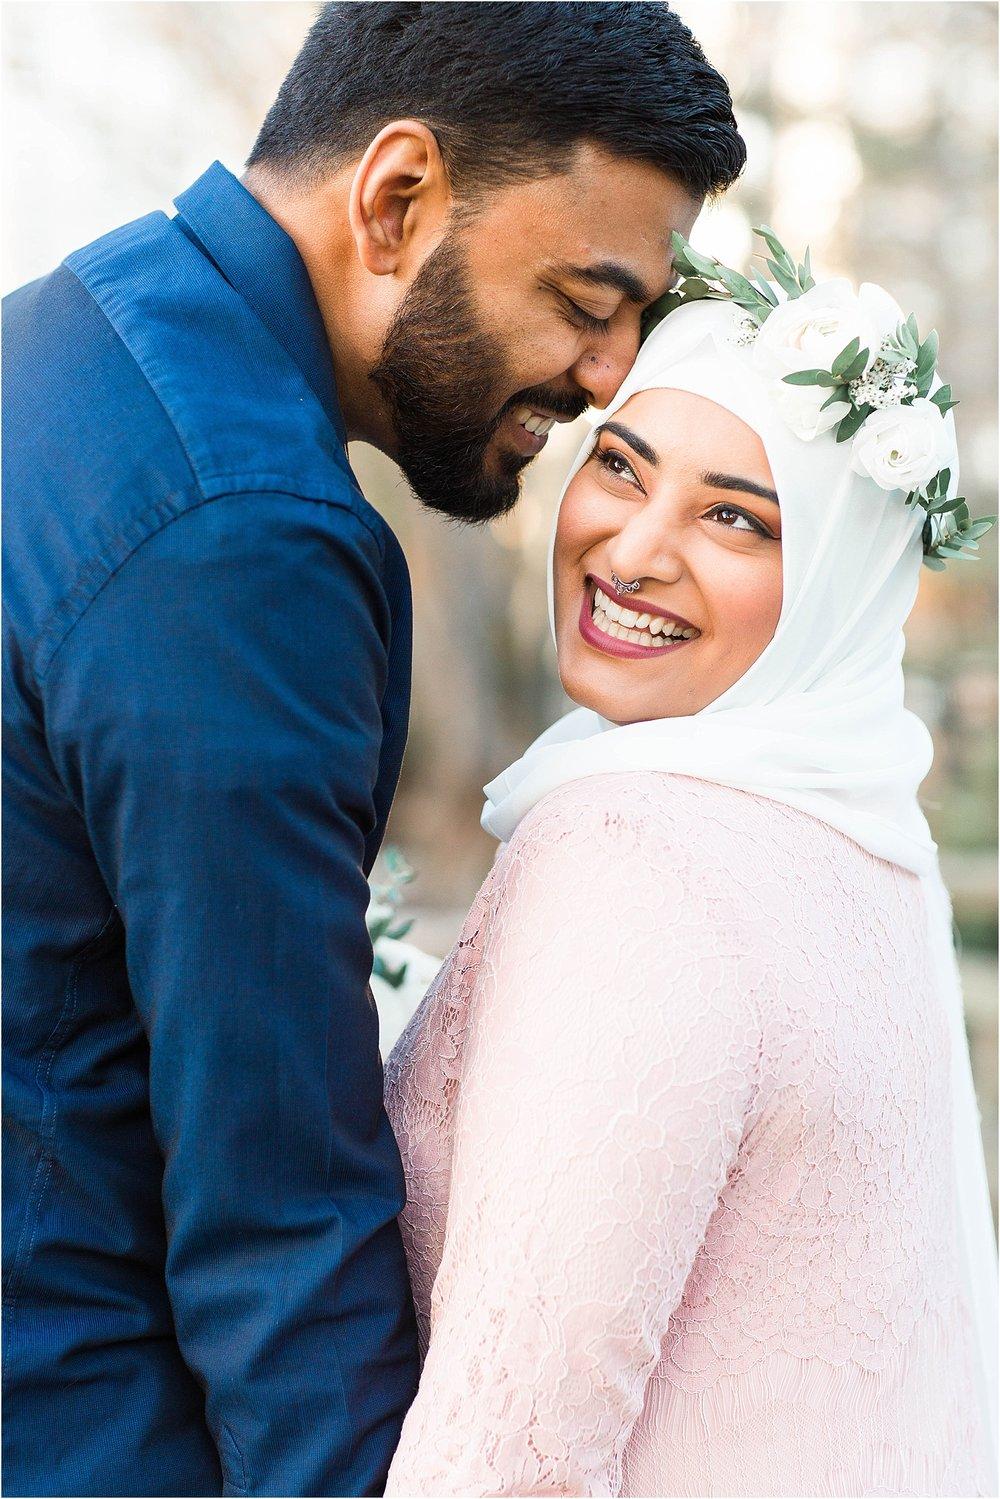 Kariya-Park-Anniversary-Session-Toronto-Mississauga-Brampton-Scarborough-GTA-Pakistani-Indian-Wedding-Engagement-Photographer-Photography_0031.jpg